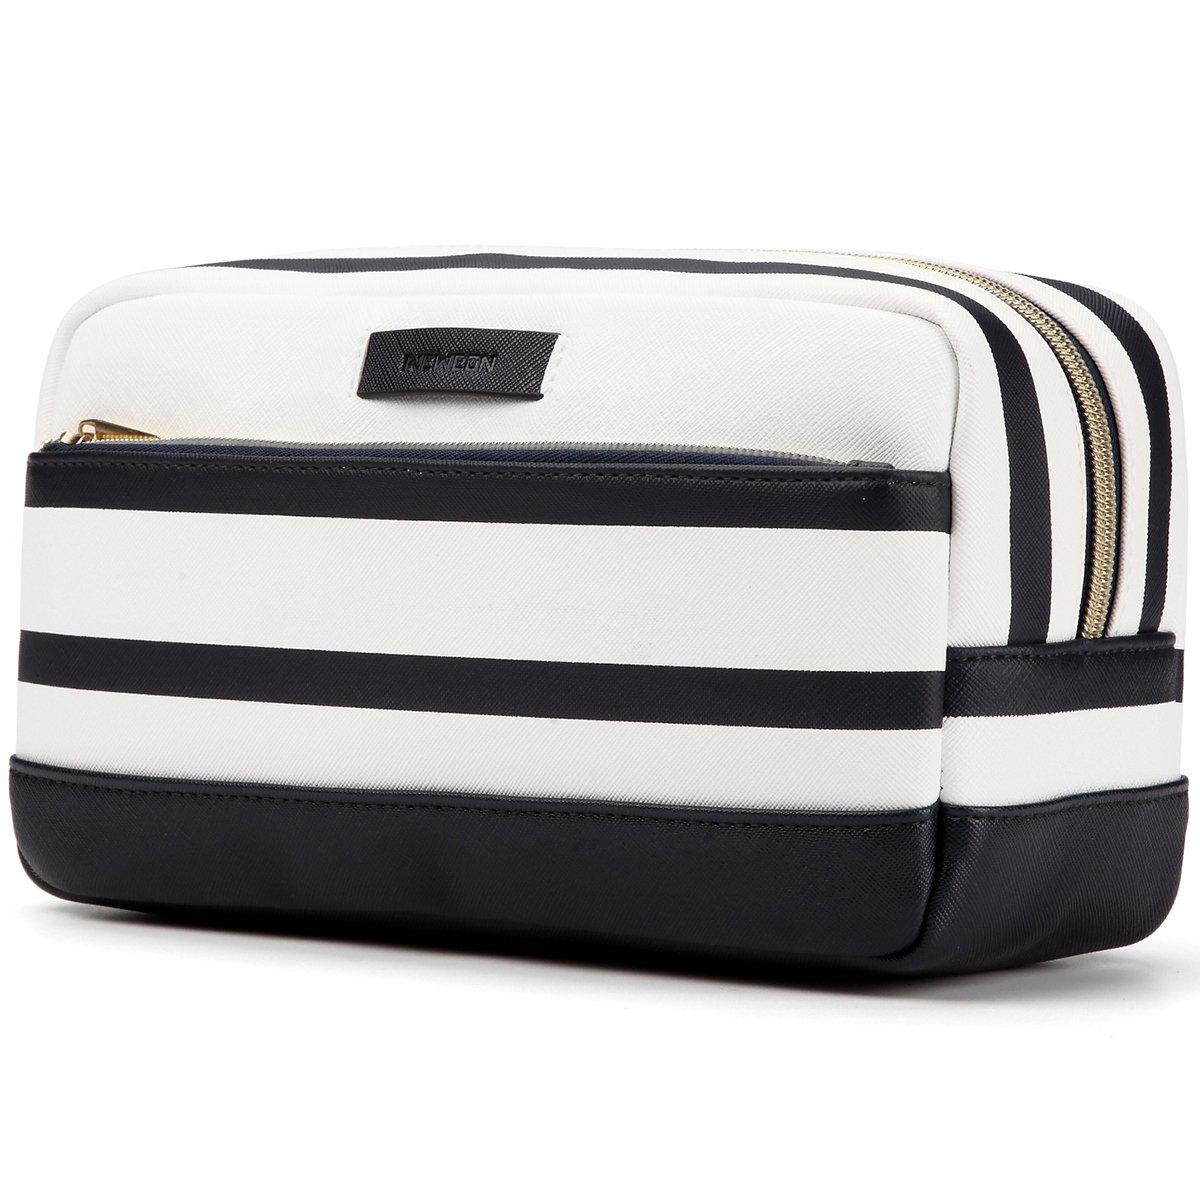 Amazon.com   Travel Toiletry Bag Dopp Kit Shaving Organizer Leather Makeup  Case for Men and Women   Beauty 5d02ea8399885